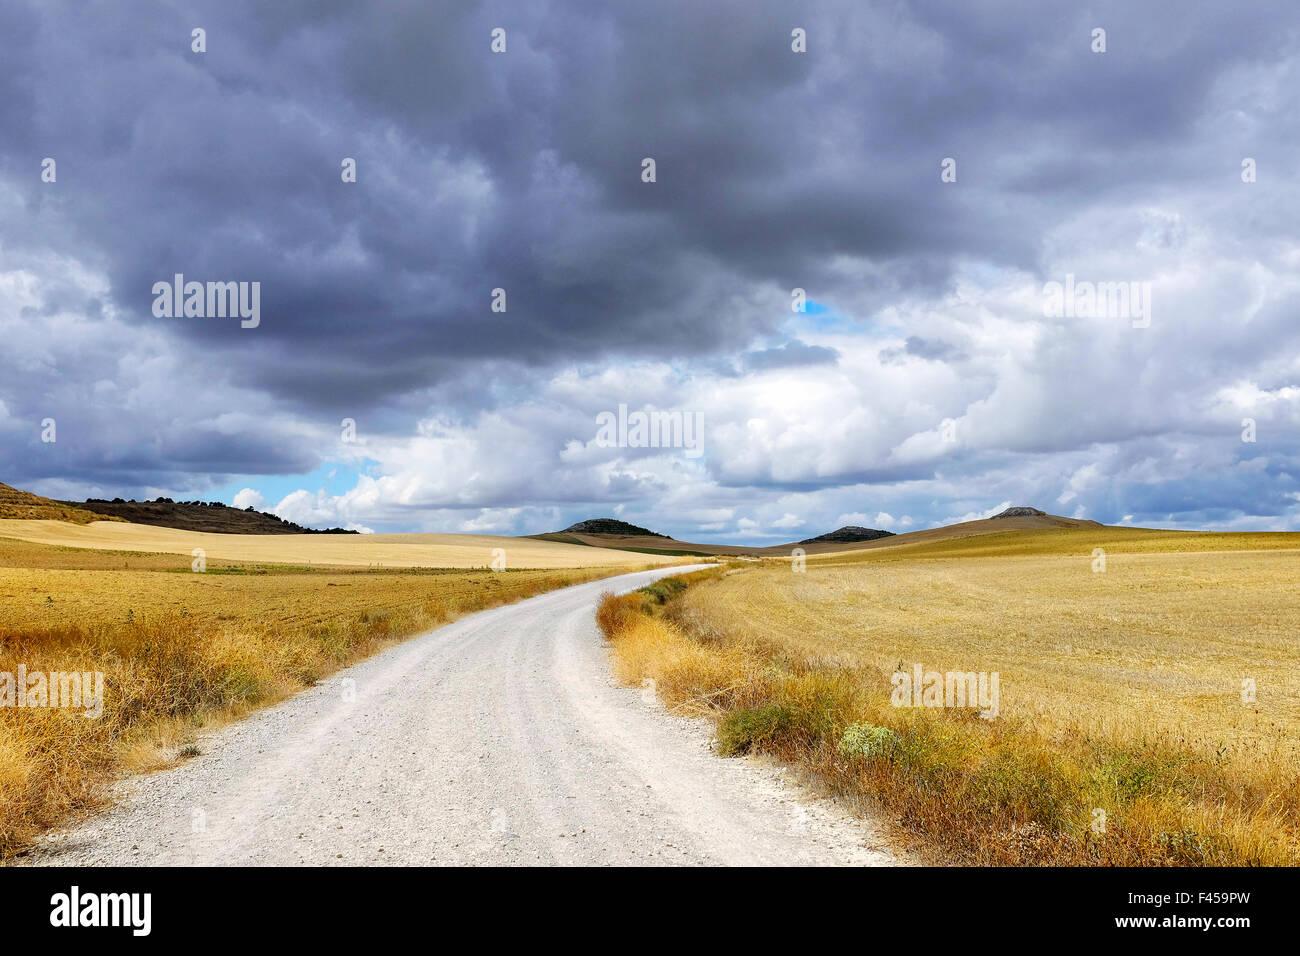 Harvested wheat fields on the Way of Saint James (Camino de Santiago) on the Carretera Boadilla del Camino - Itero - Stock Image